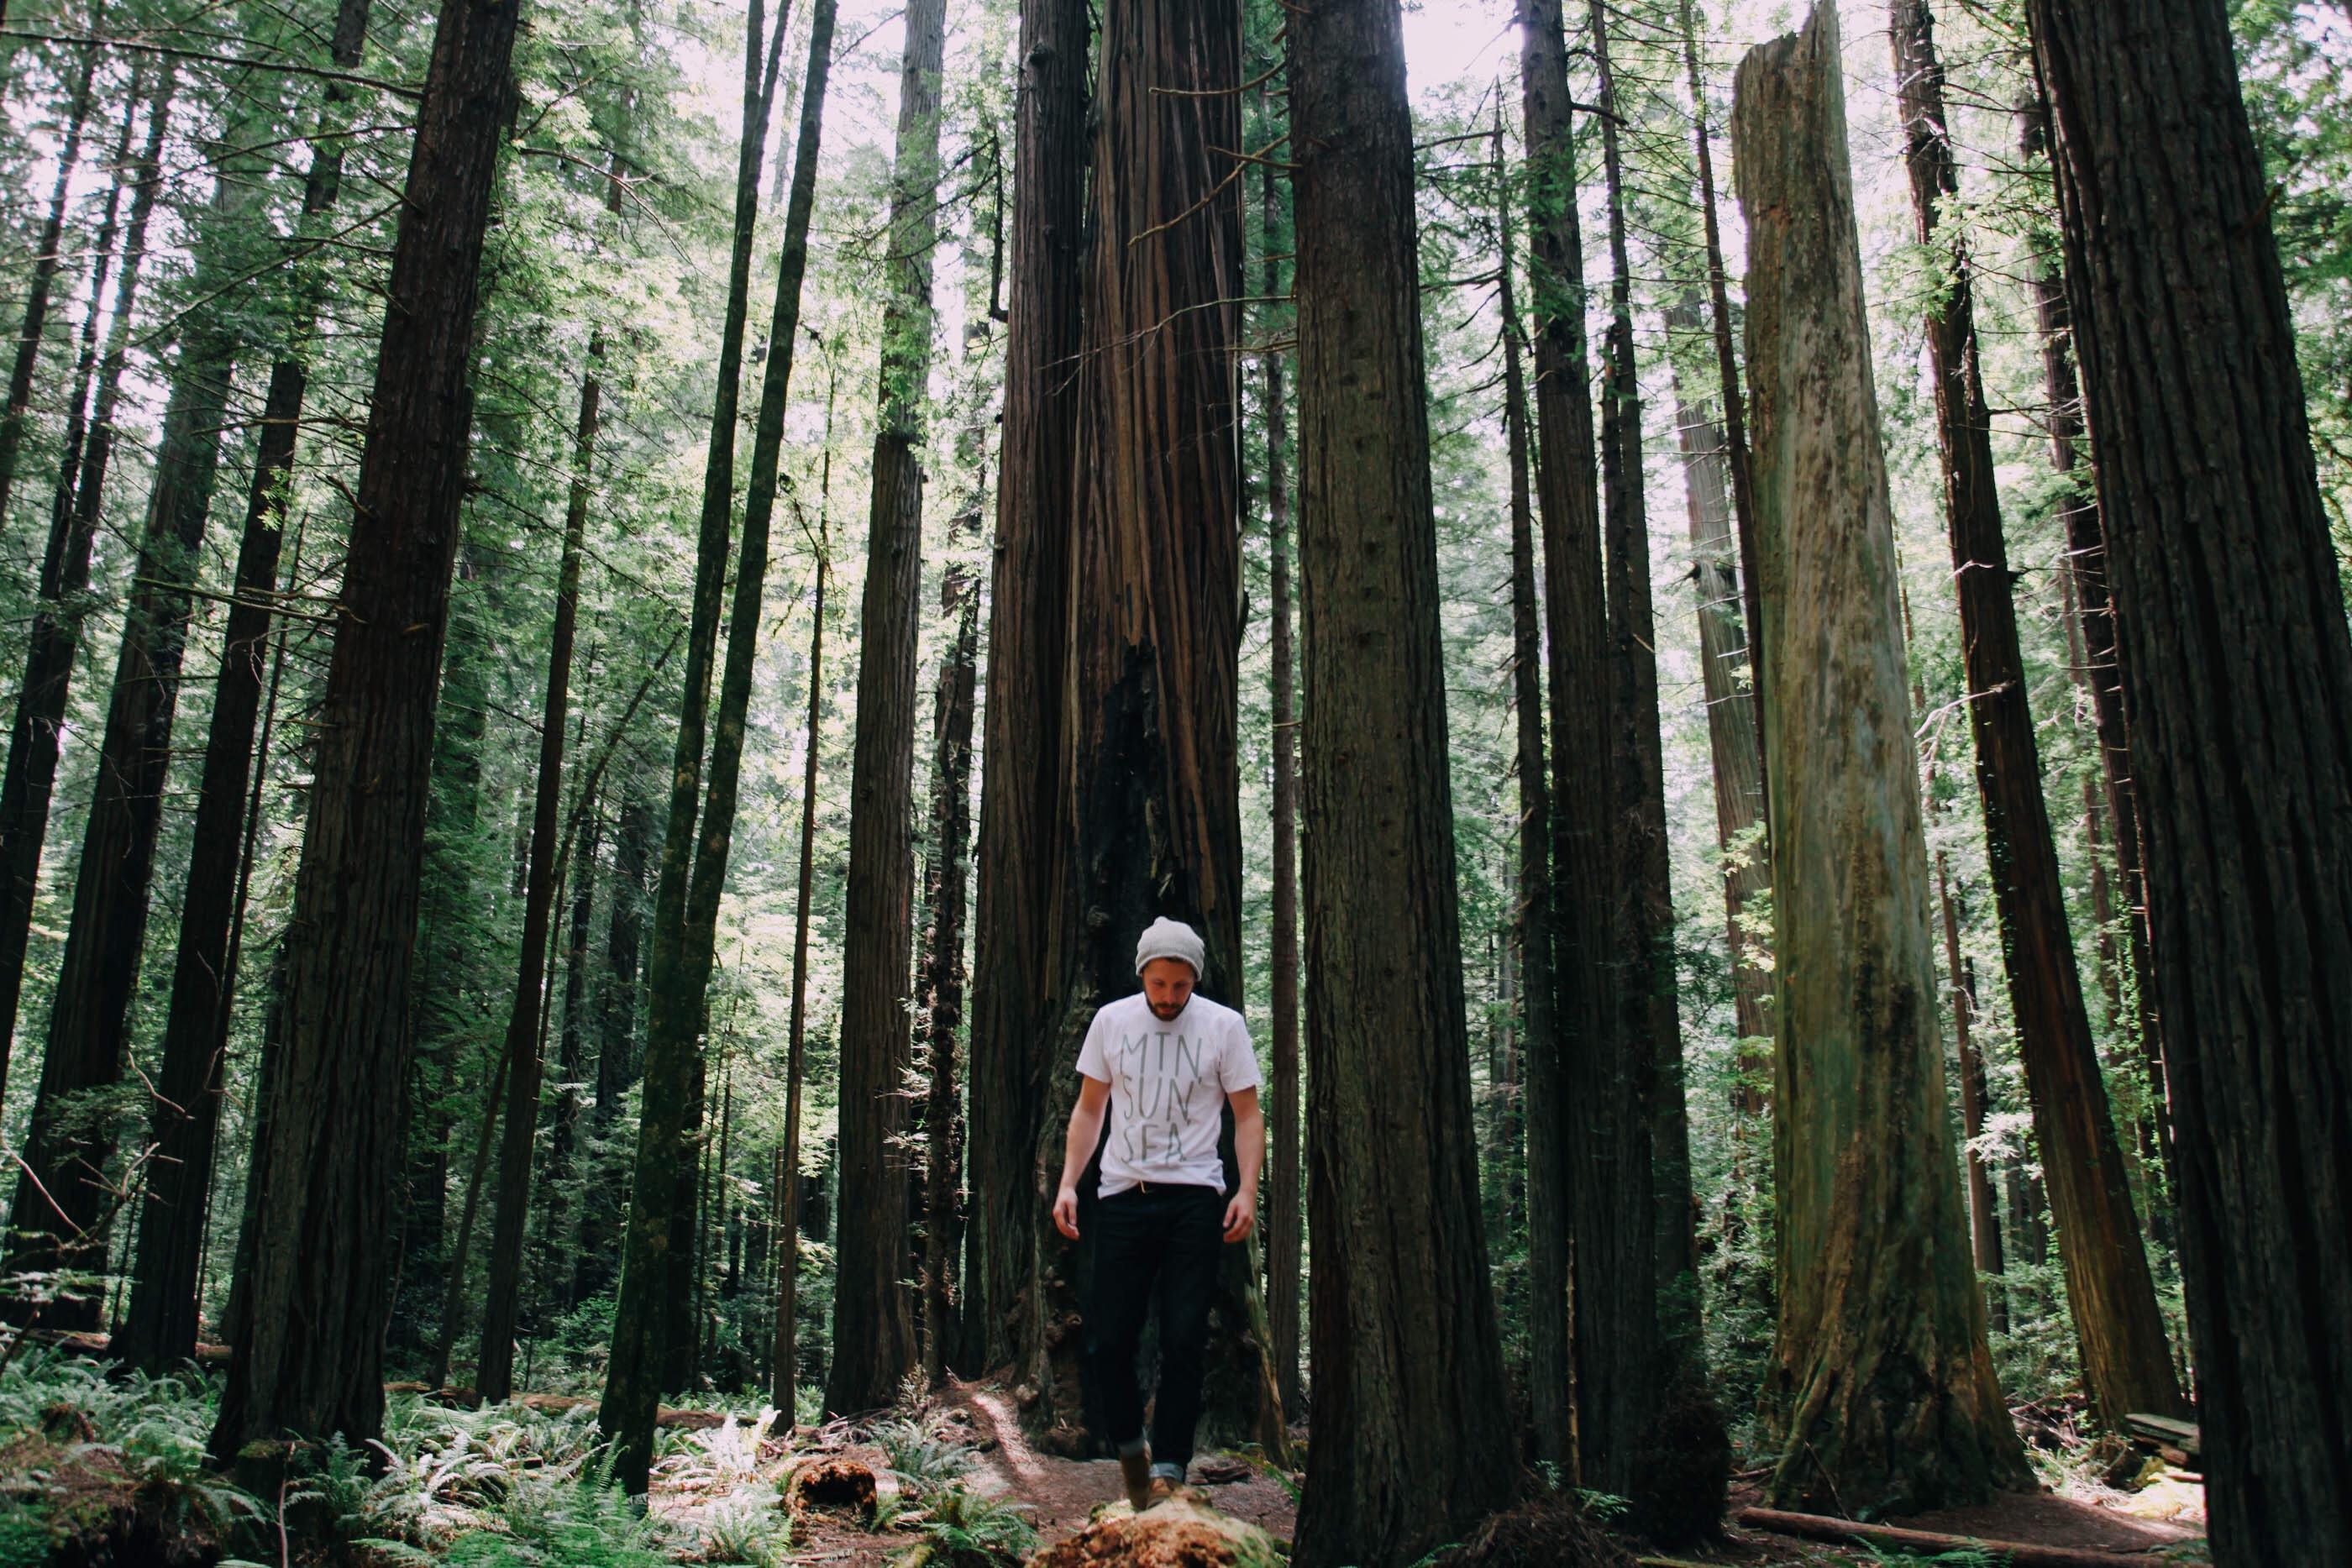 hiking-in-the-redwoods_t20_wKdegW (1)